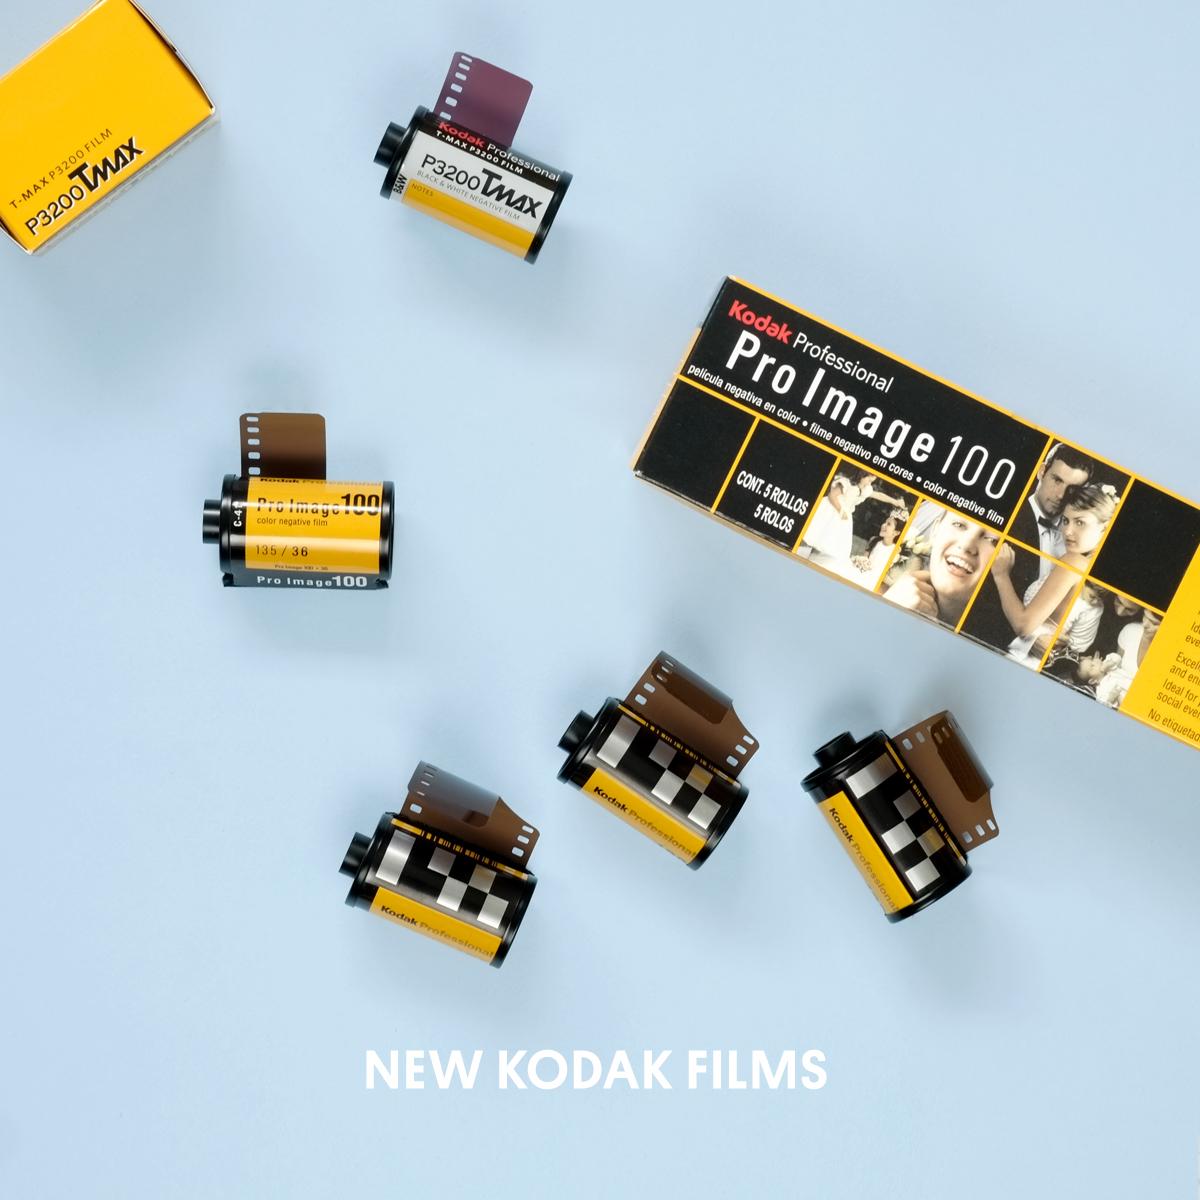 New Kodak Film T-Max P3200 Pro Image 100